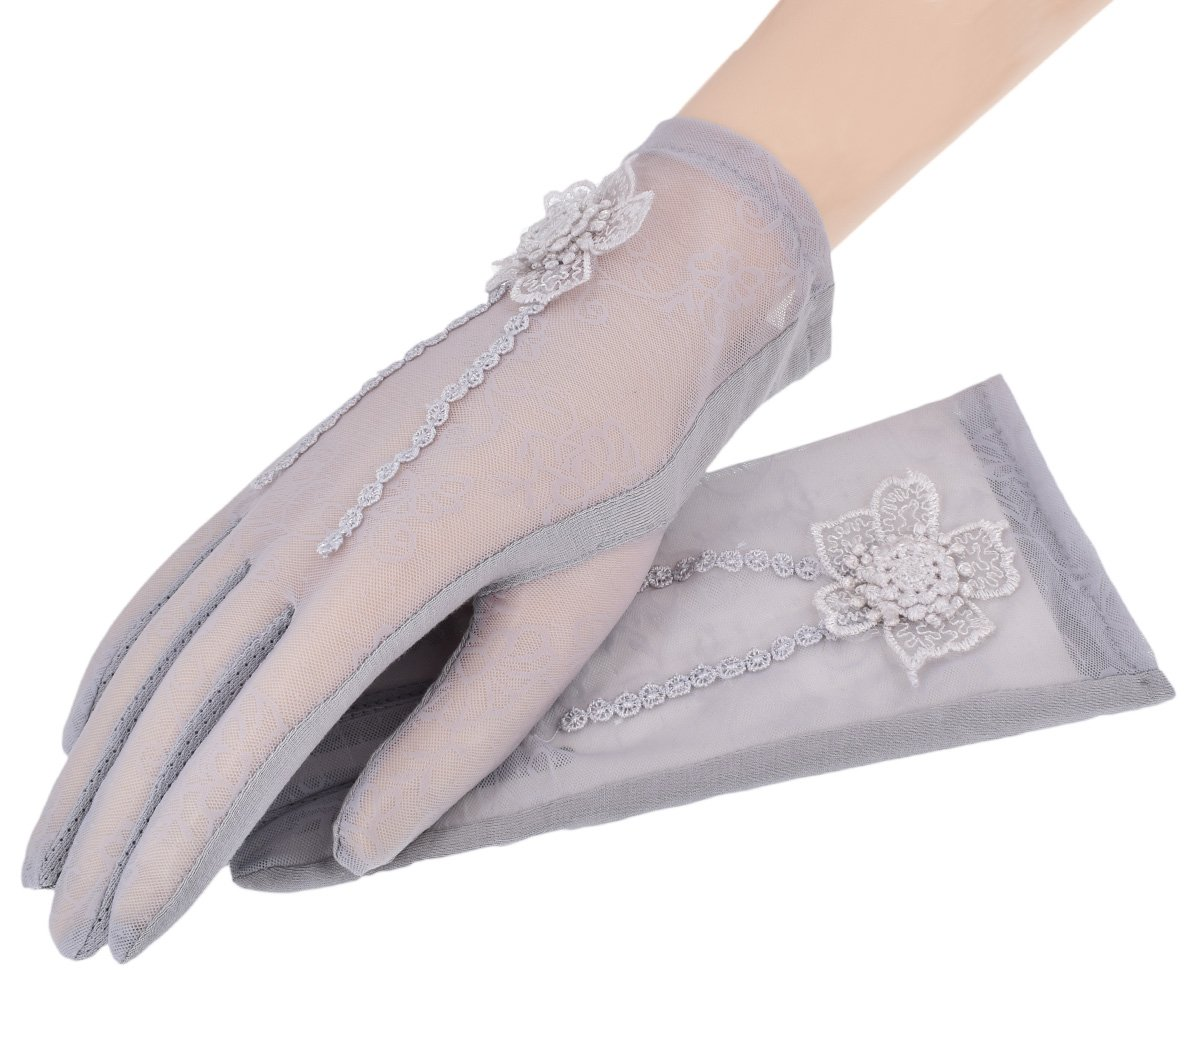 Nurbijar Summer Women UV Protection Touch Screen Lace Gloves-Grey